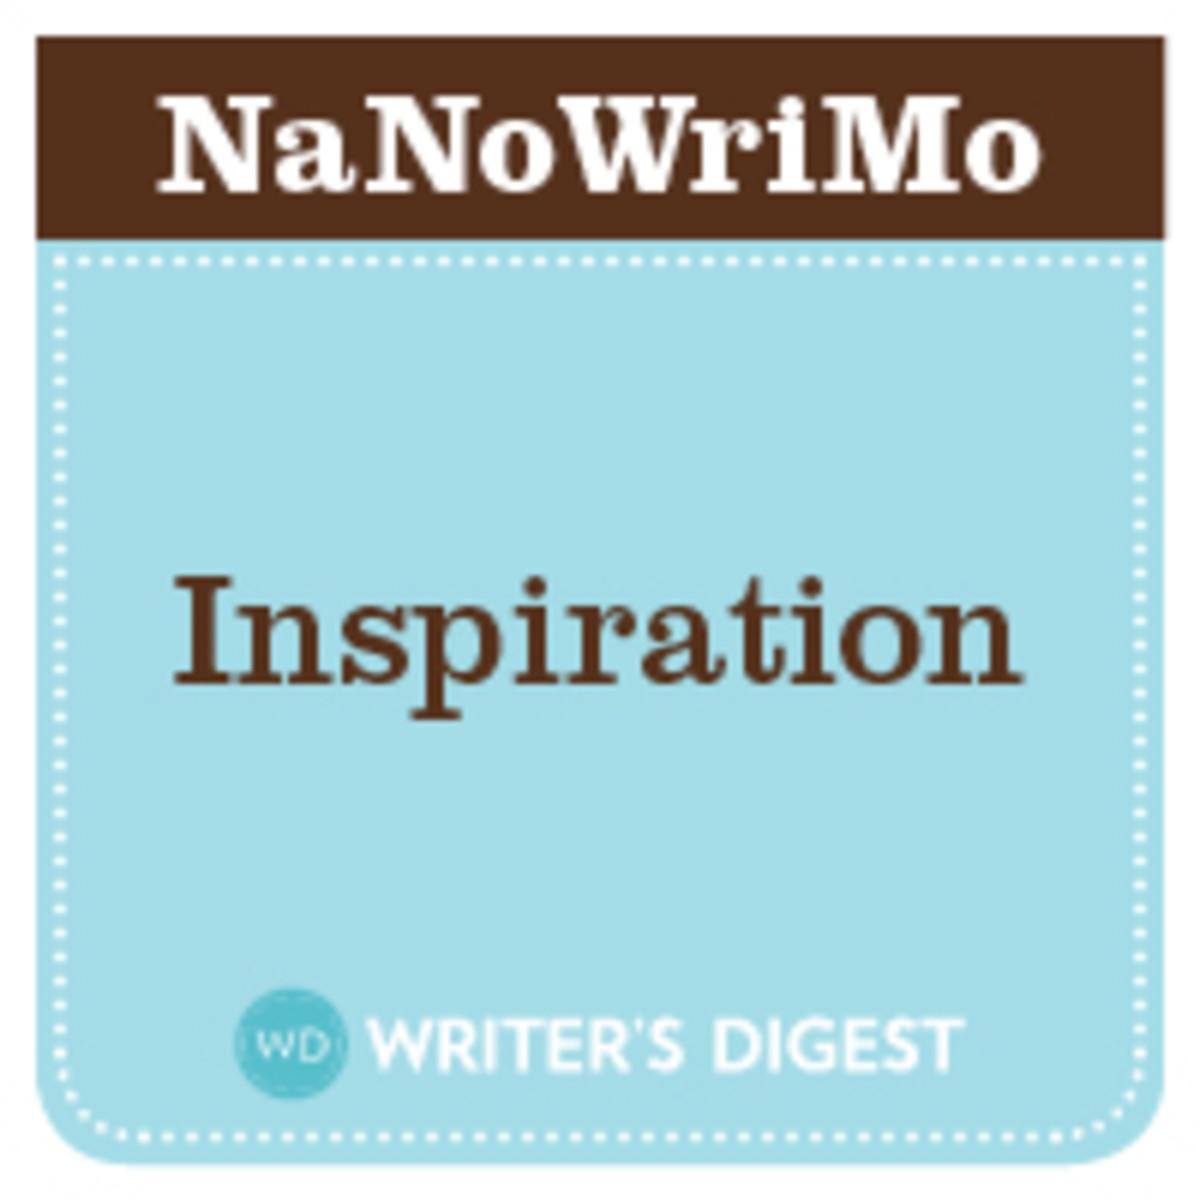 NaNoWriMo8